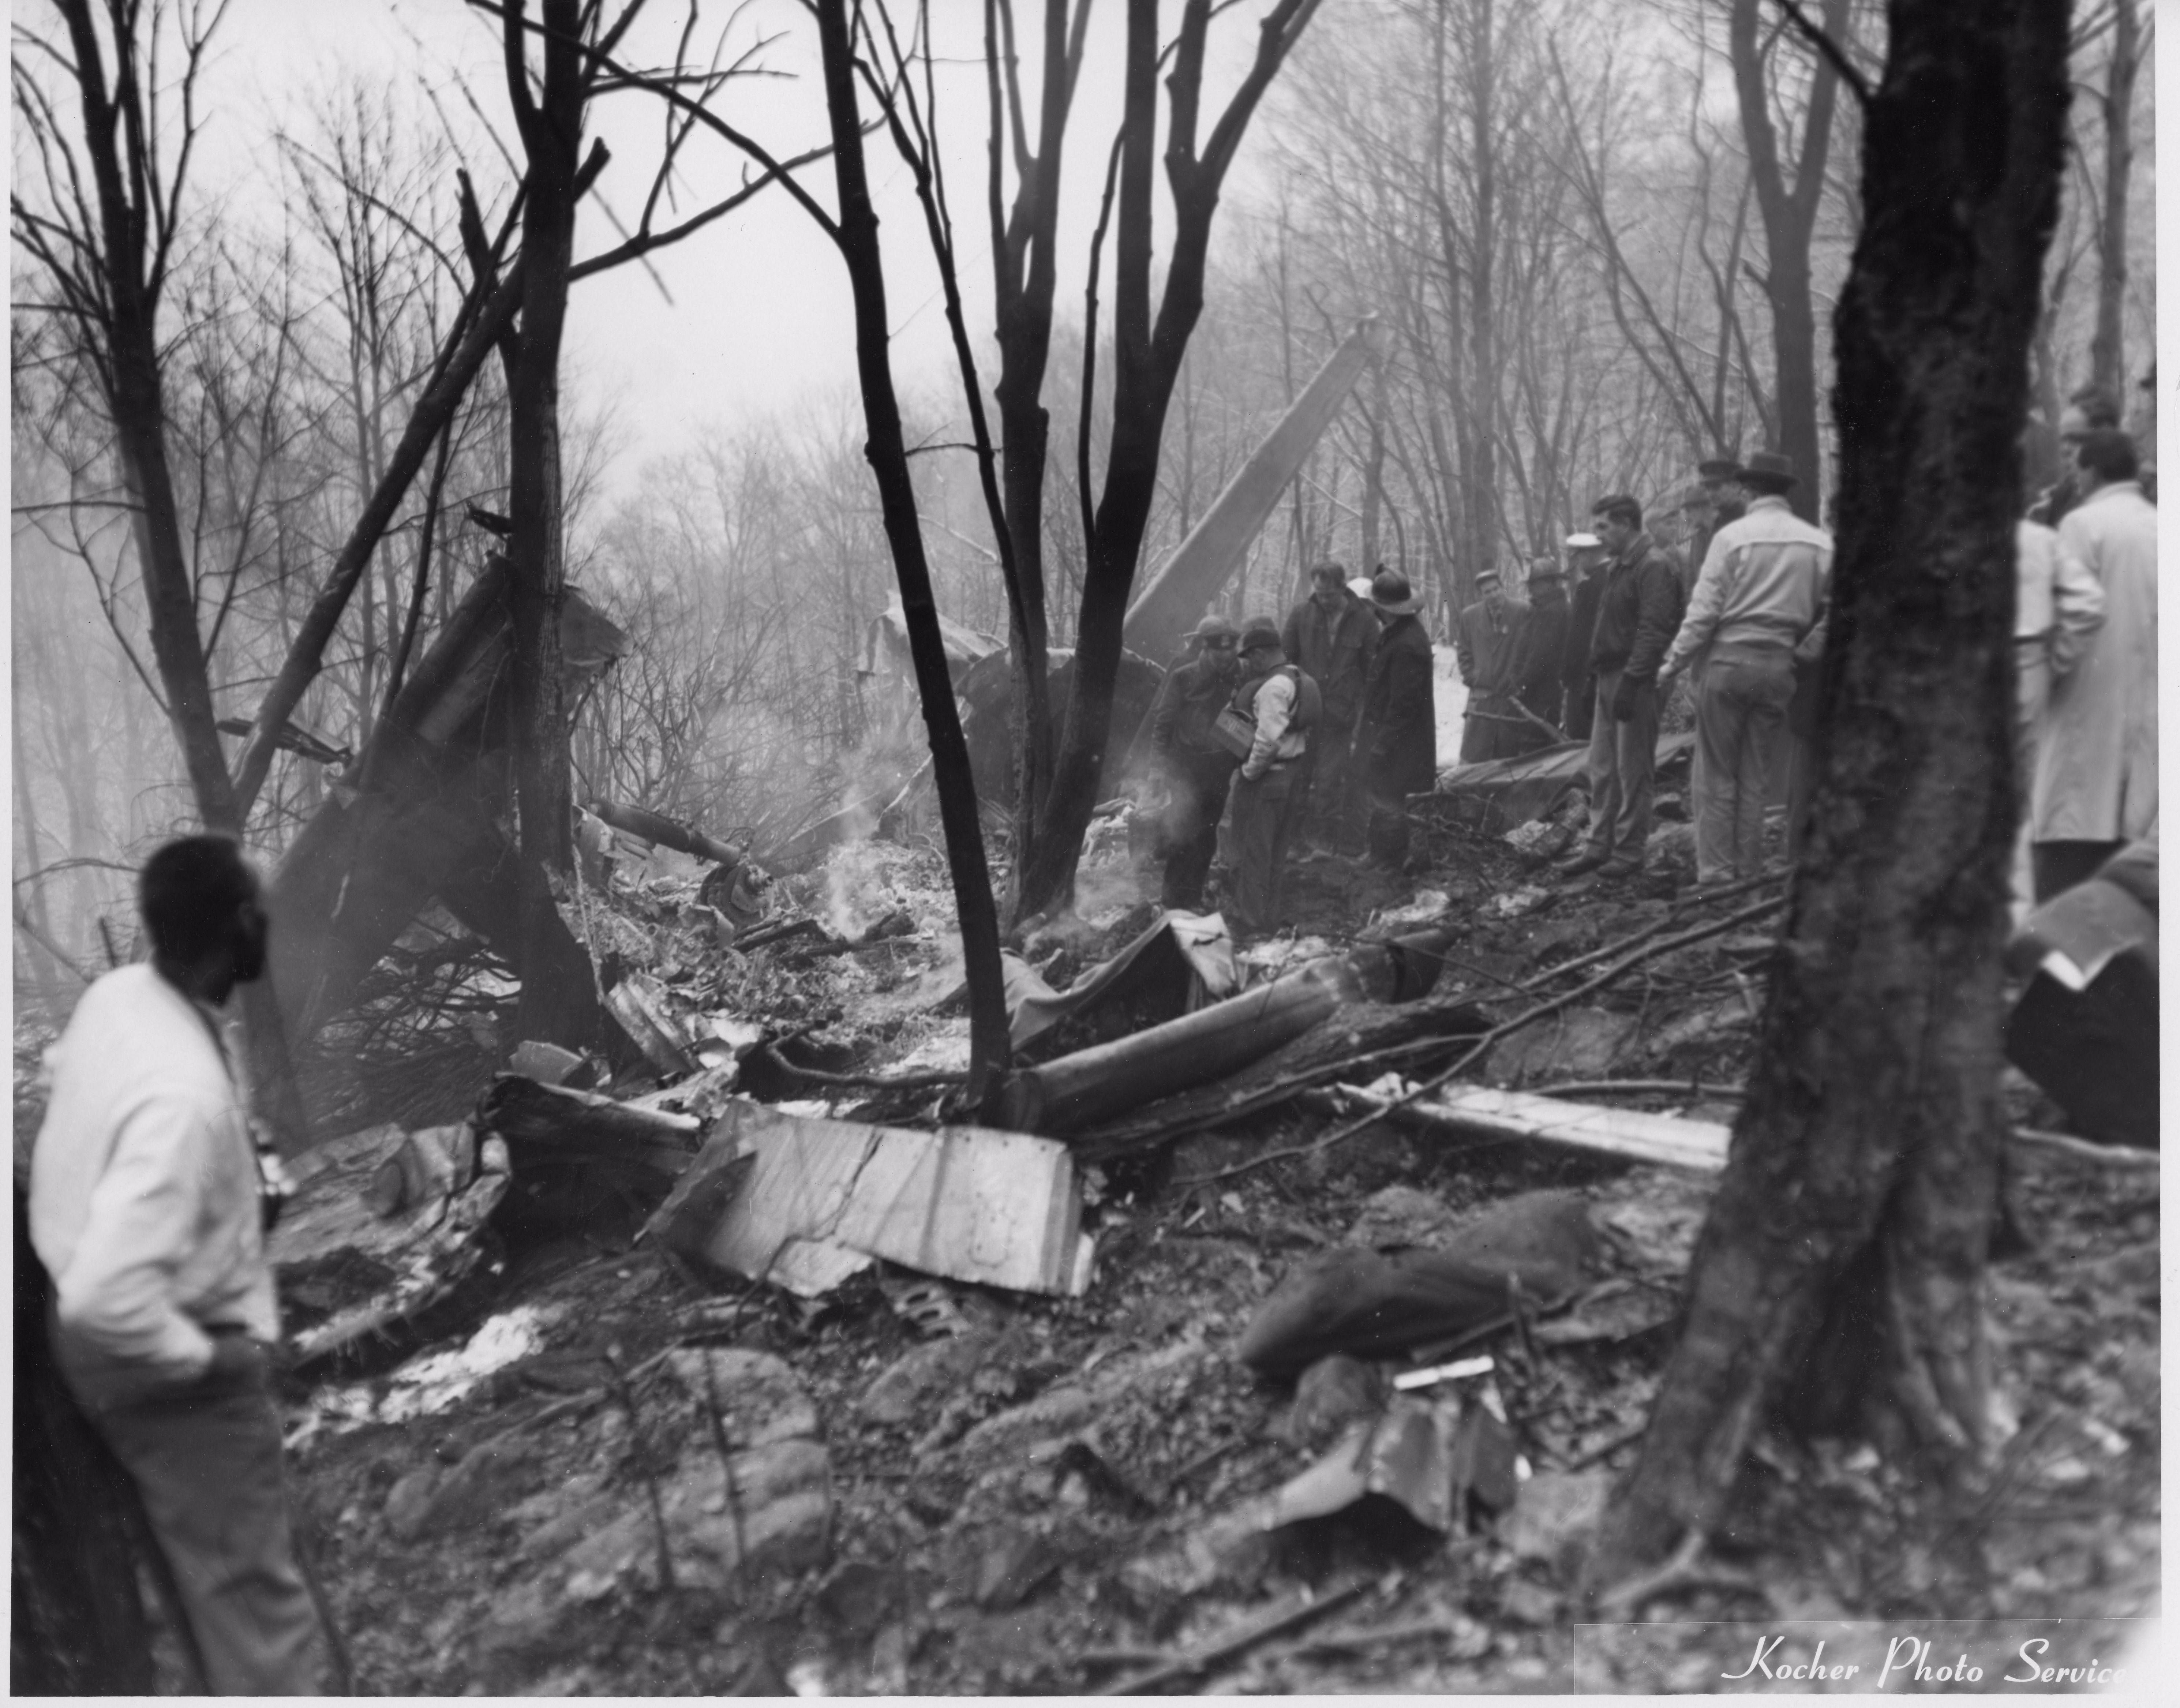 Plane wreckage. Photo courtesy of the Williamsport Sun Gazette archive.